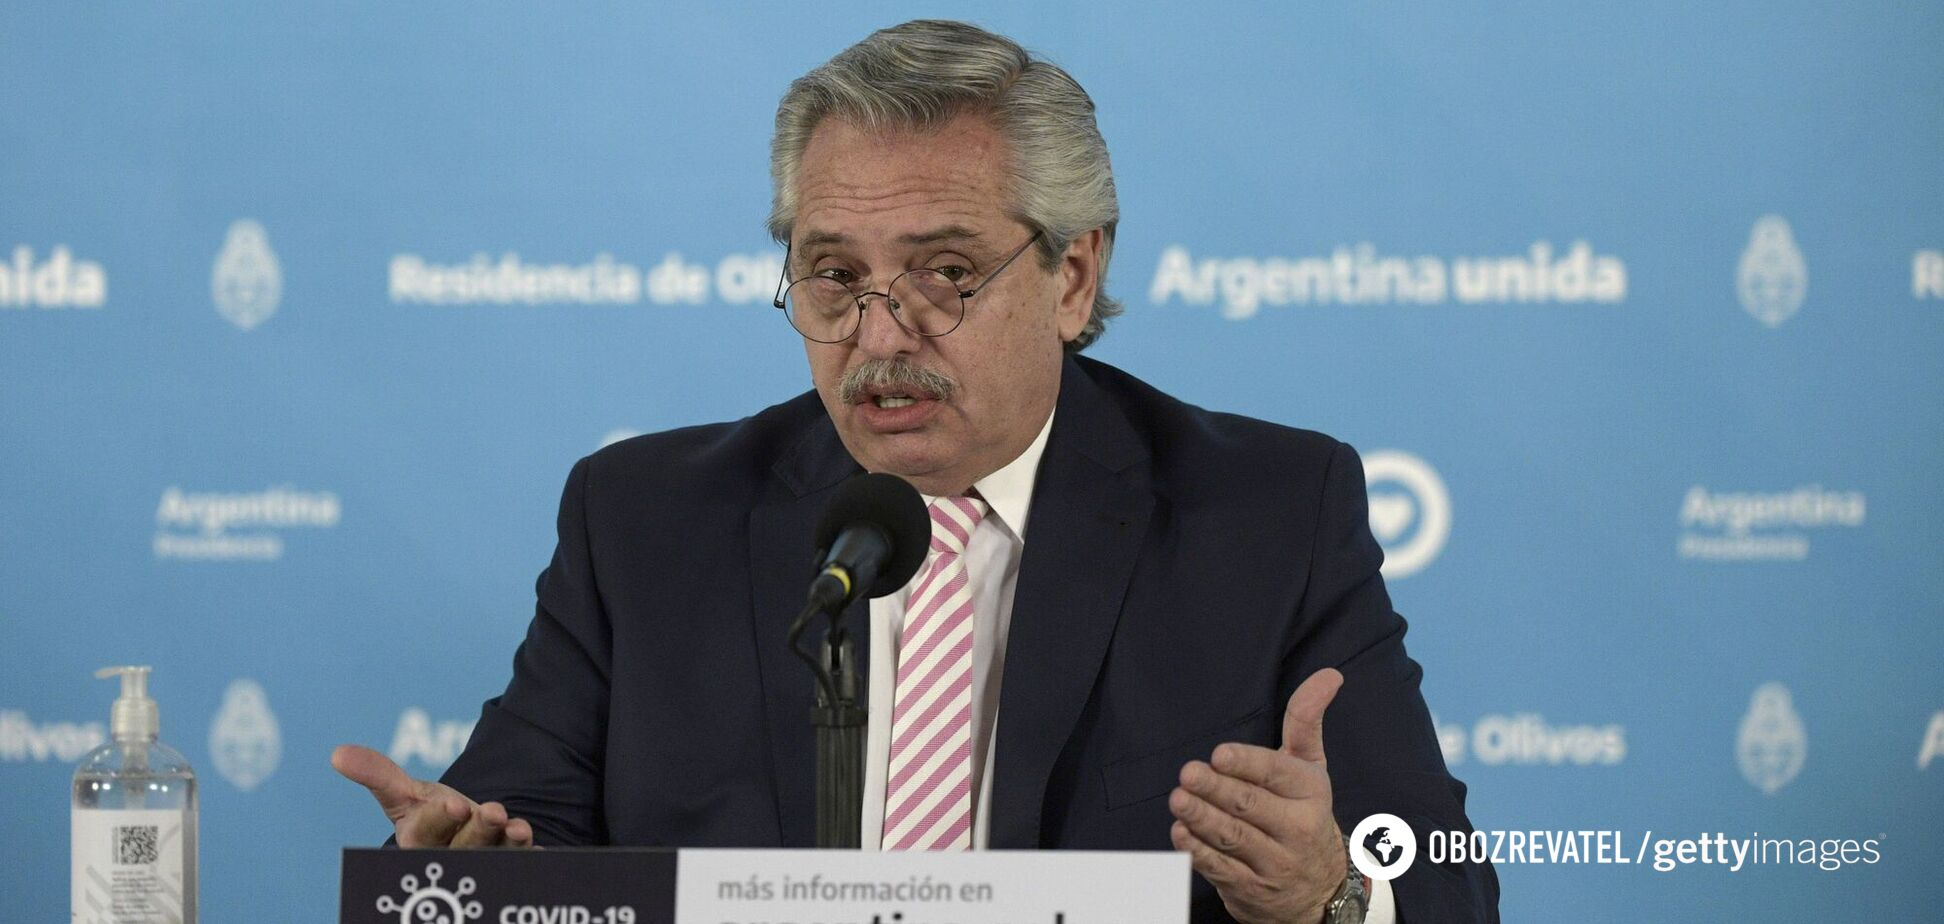 Президент Аргентины заразился COVID-19 после вакцинации 'Спутником V'